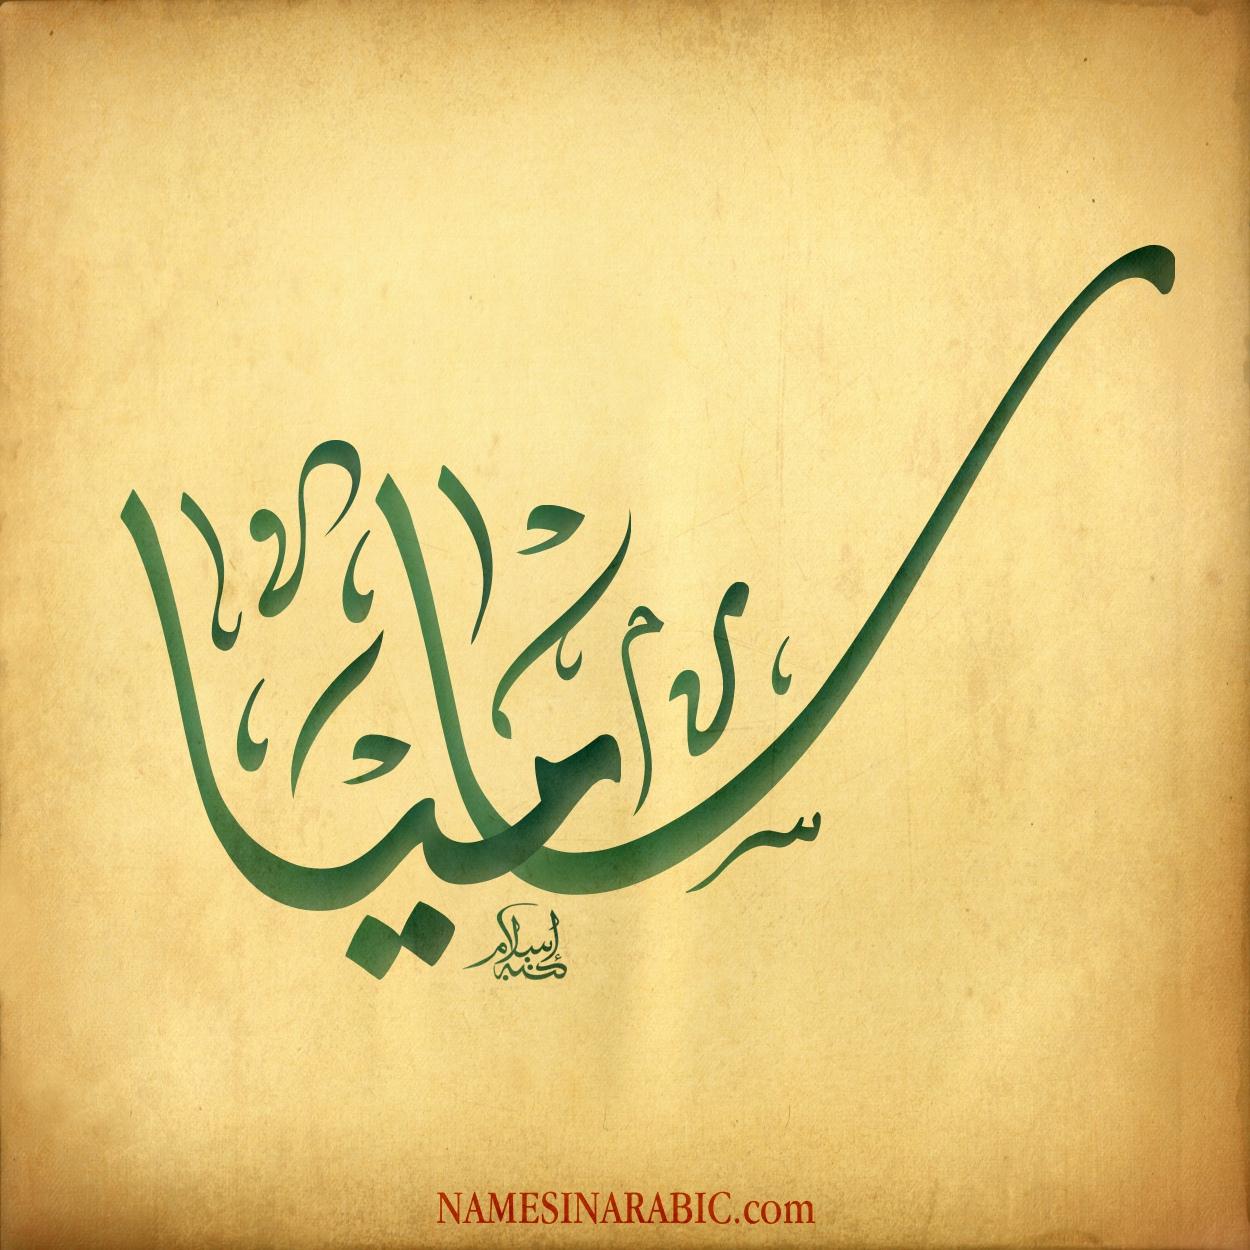 Samia-Name-in-Arabic-Diwani-Calligraphy.jpg